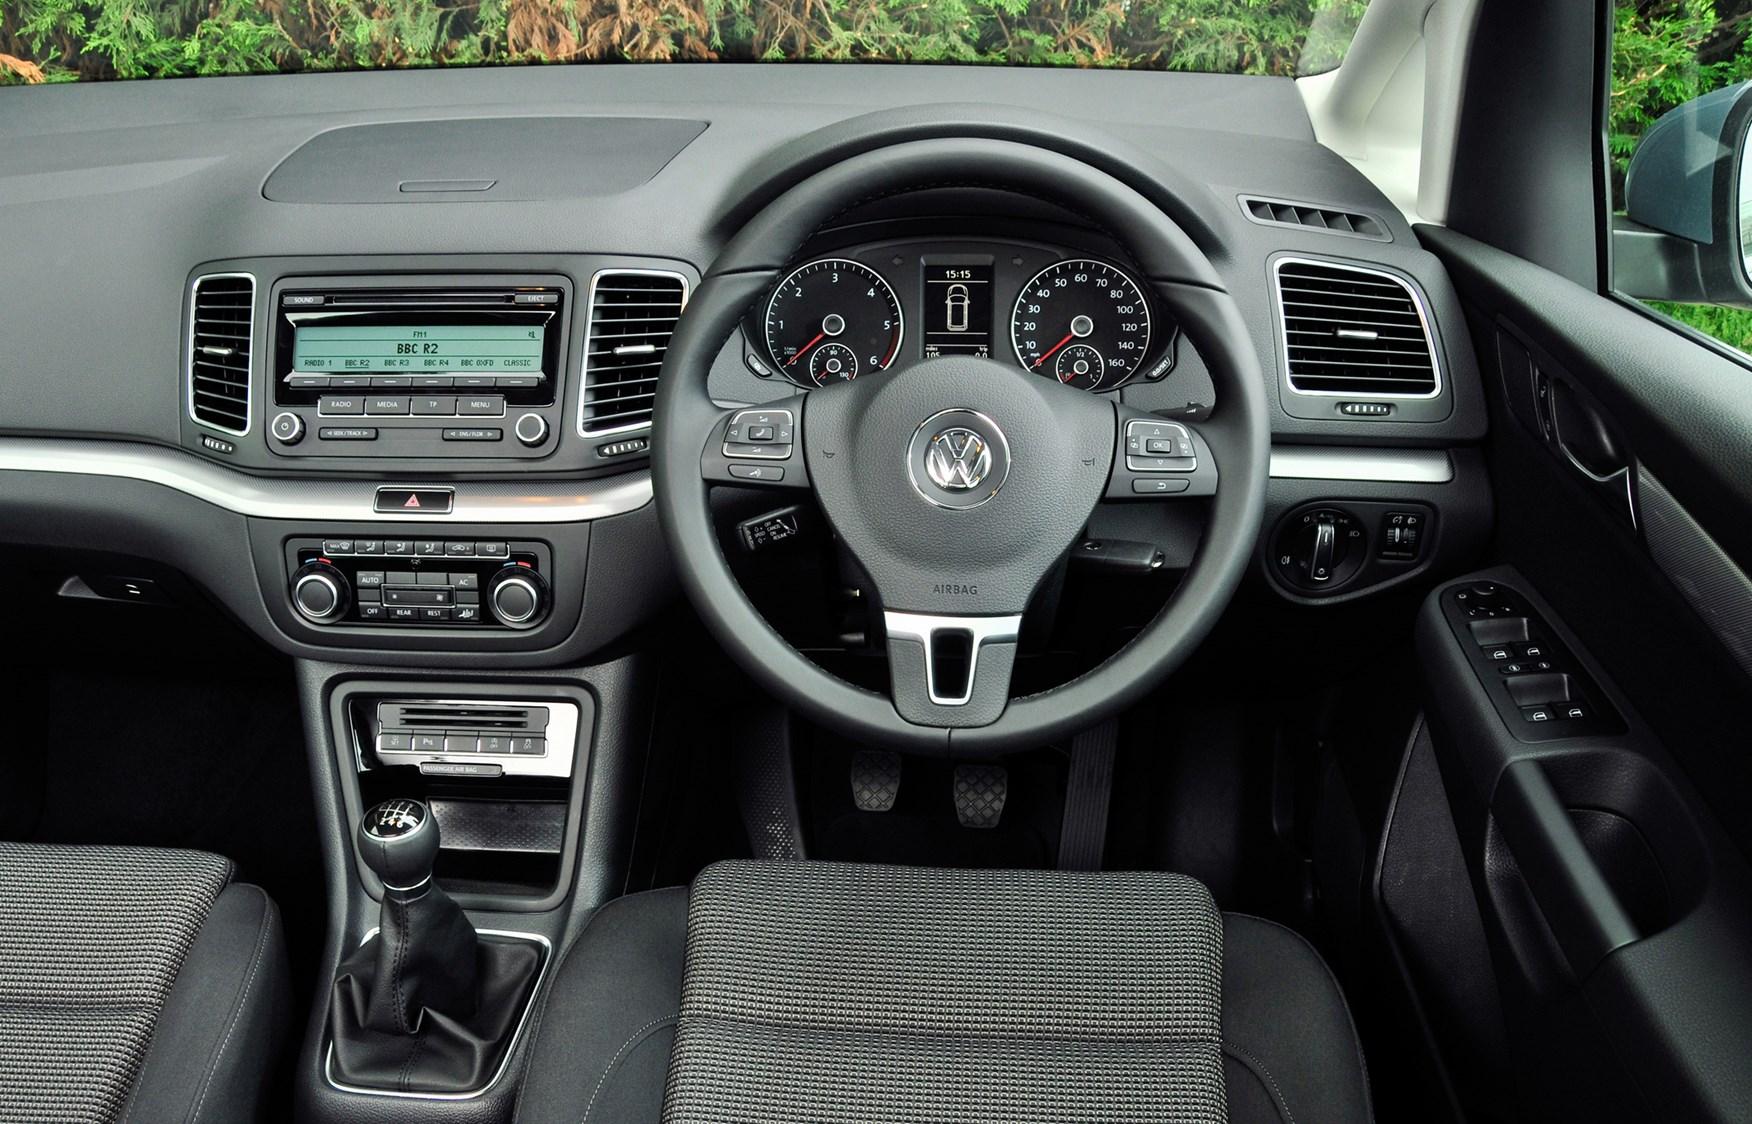 Insure Com Review >> Volkswagen Sharan Estate Review (2010 - ) | Parkers